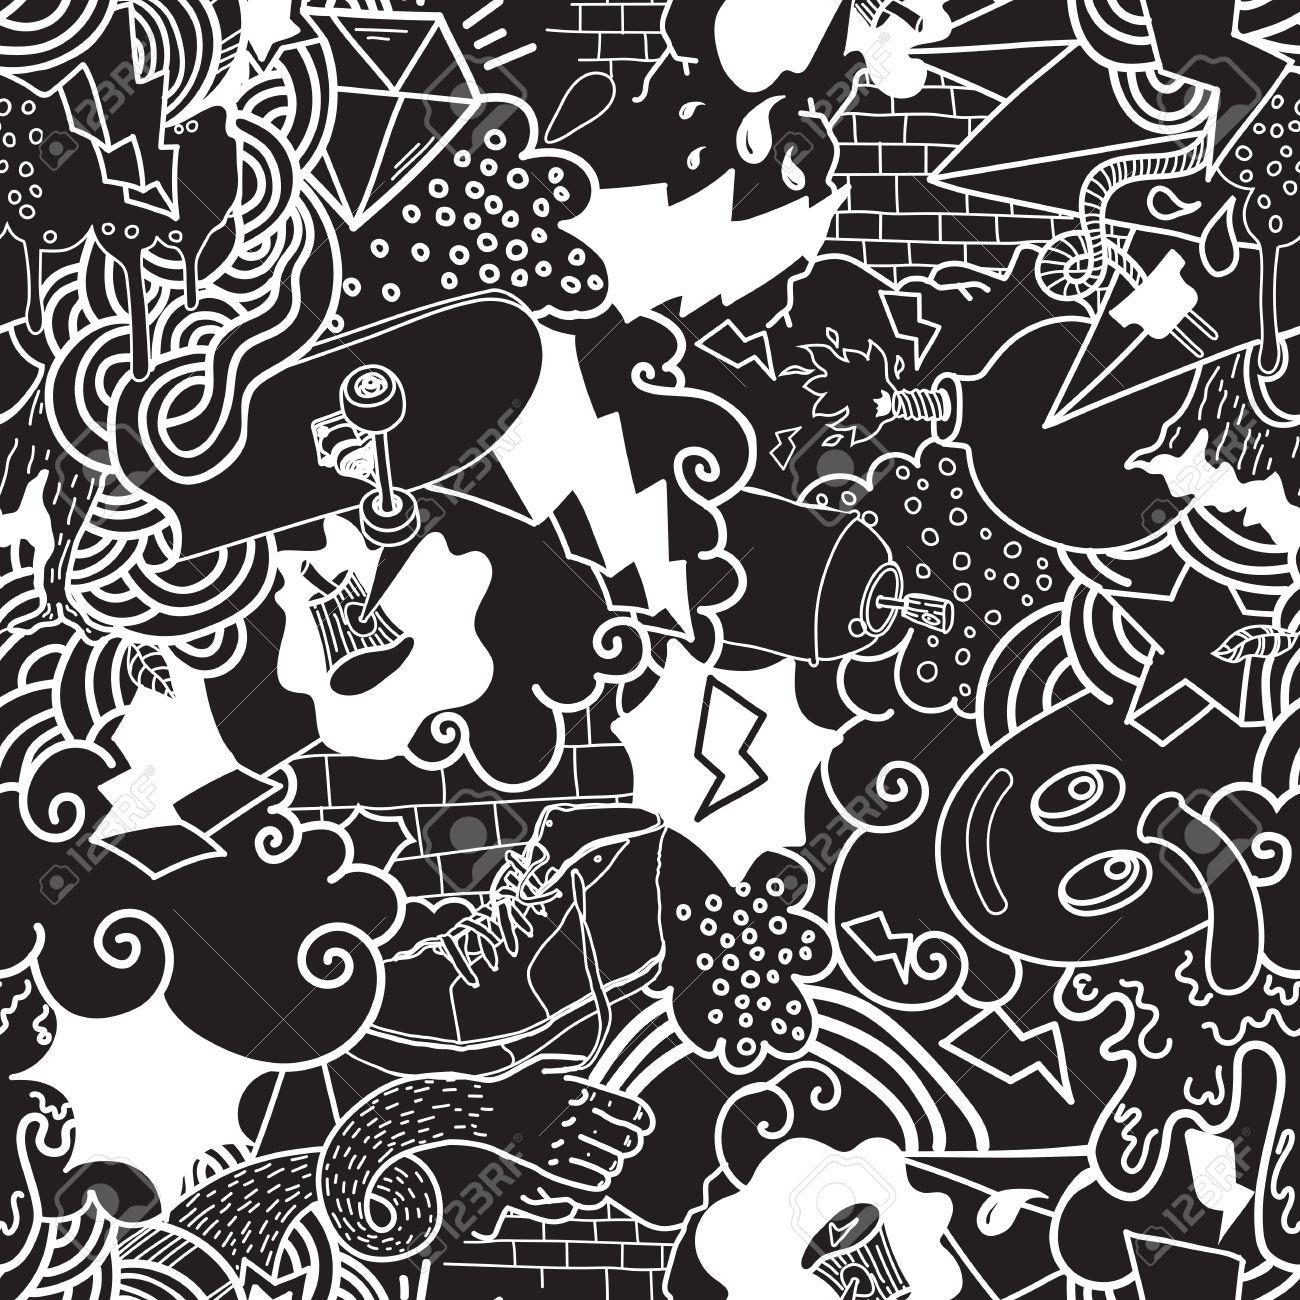 Seamless Pattern Graffiti Doodles Street Art Illustration In